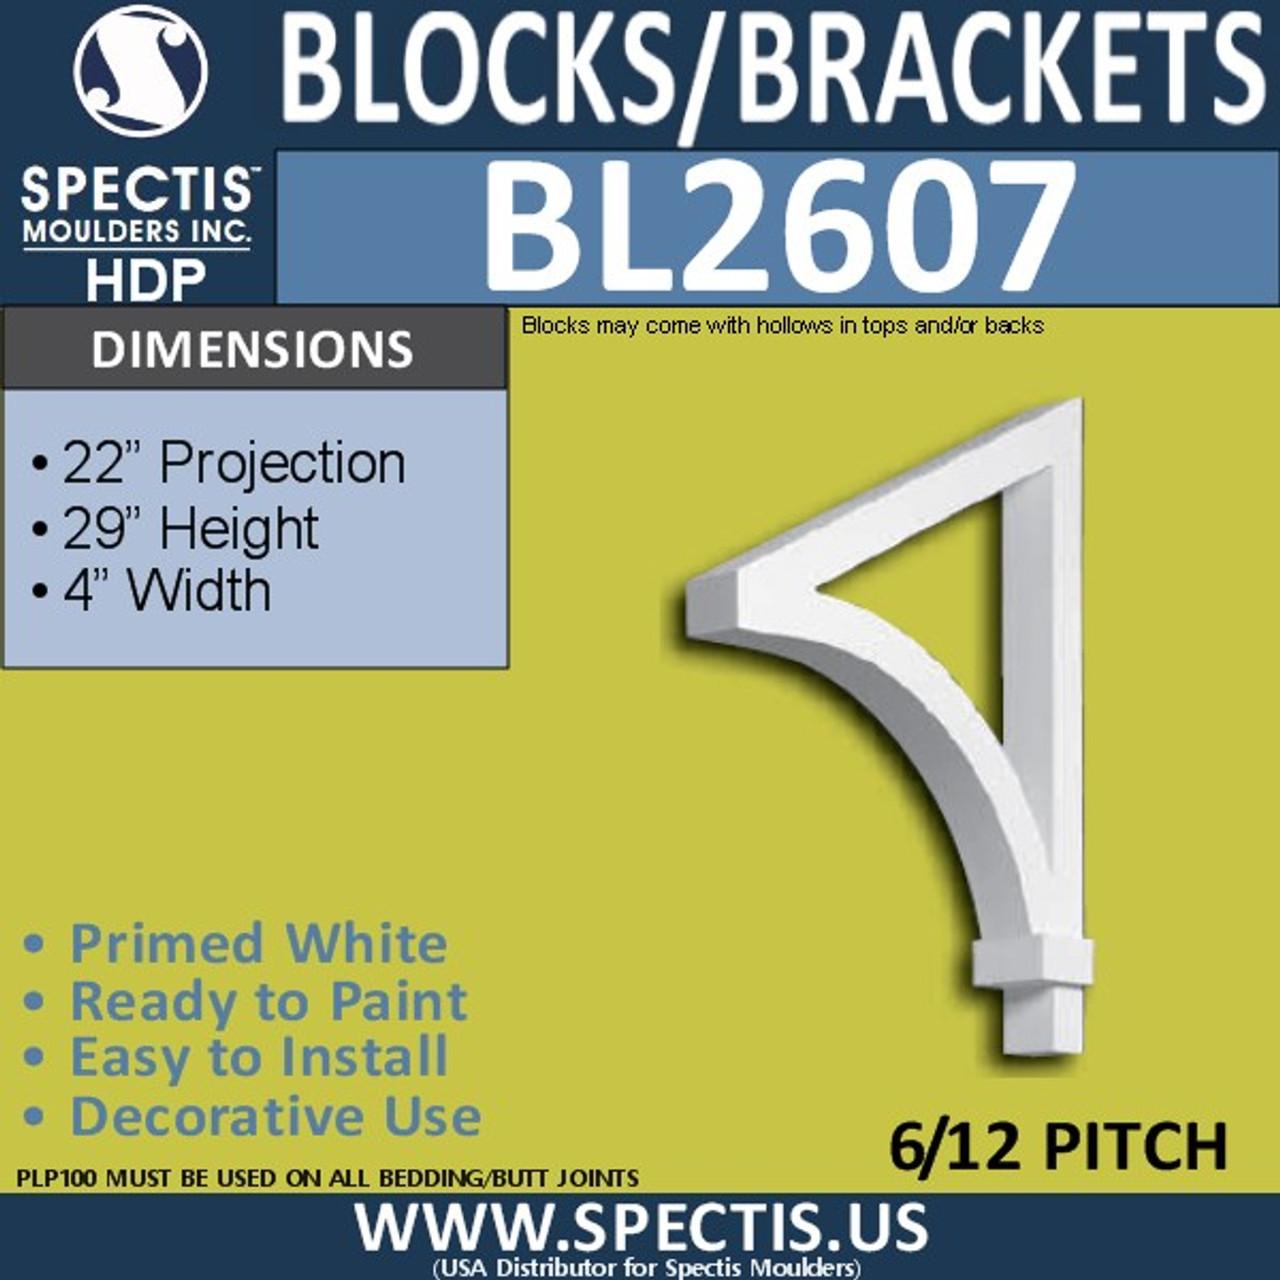 "BL2607 Eave Block or Bracket 4""W x 29""H x 22"" P"